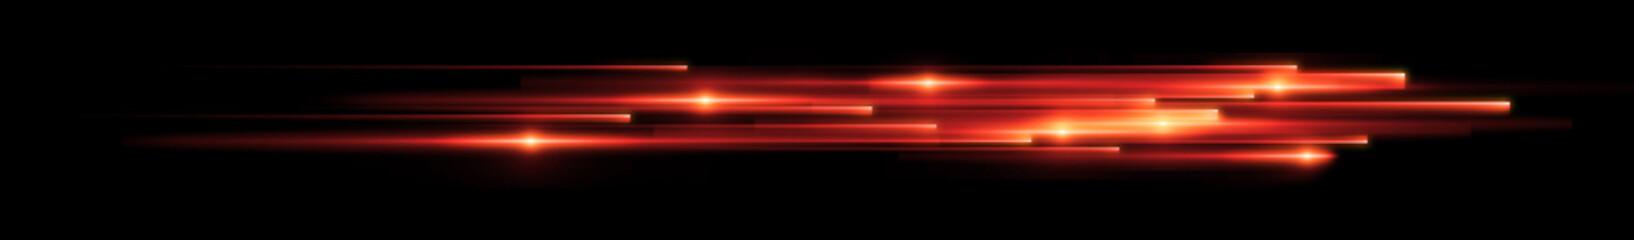 Dynamic lights shape on dark background. High speed optical fiber concept. 3d rendering